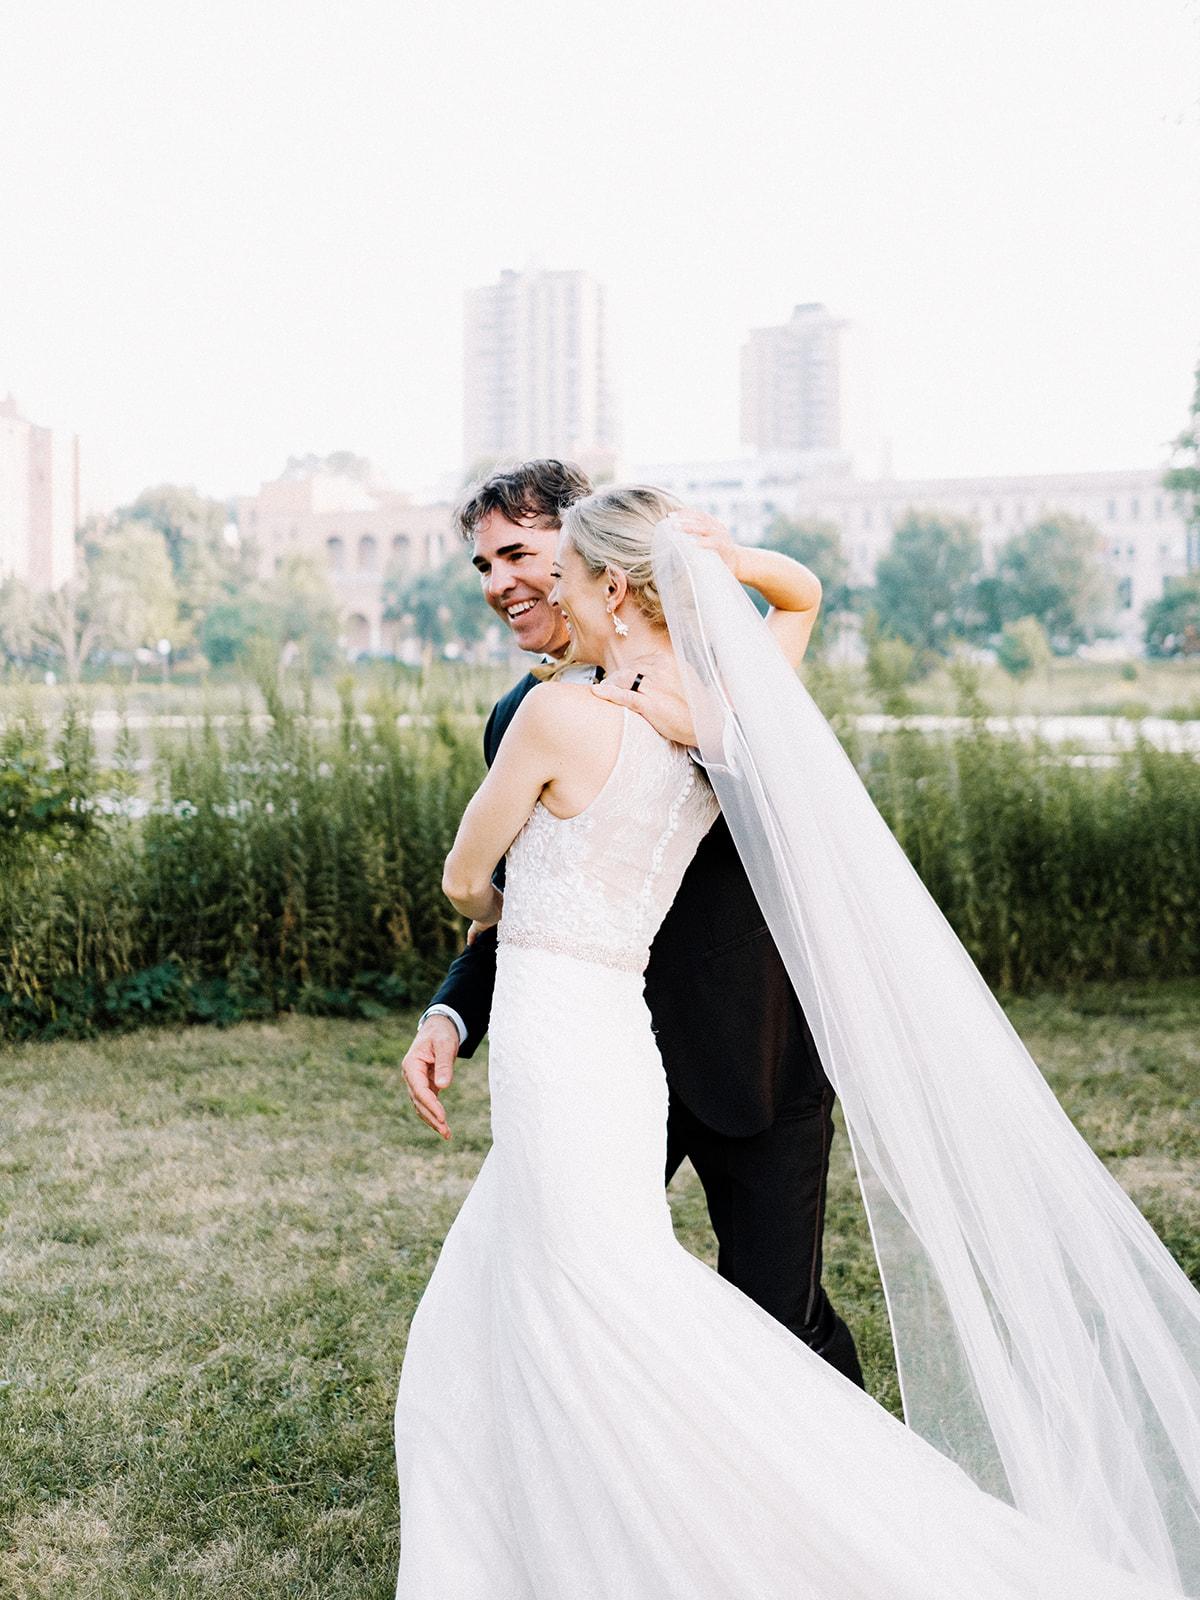 Billy_Genna_wedding-657.jpg